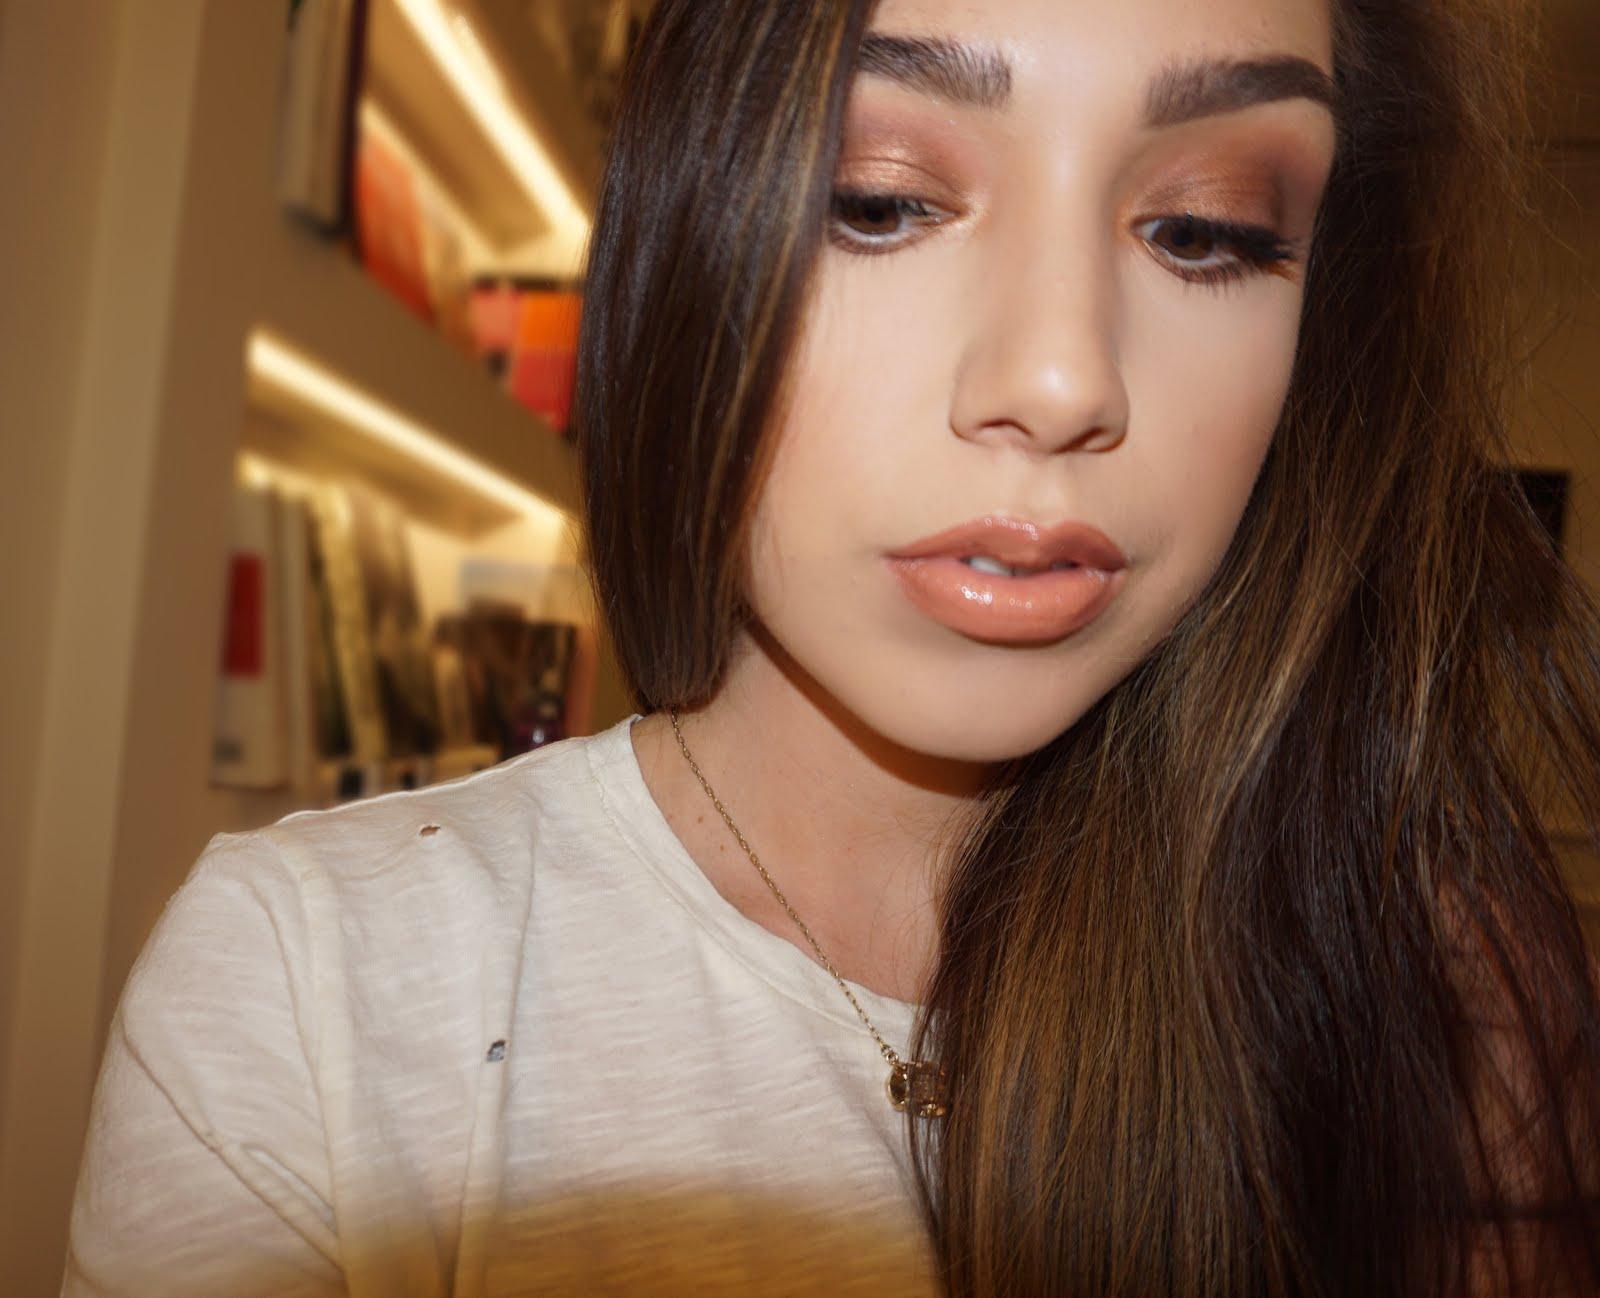 beauty and bananas : melissa alatorre did my makeup!?